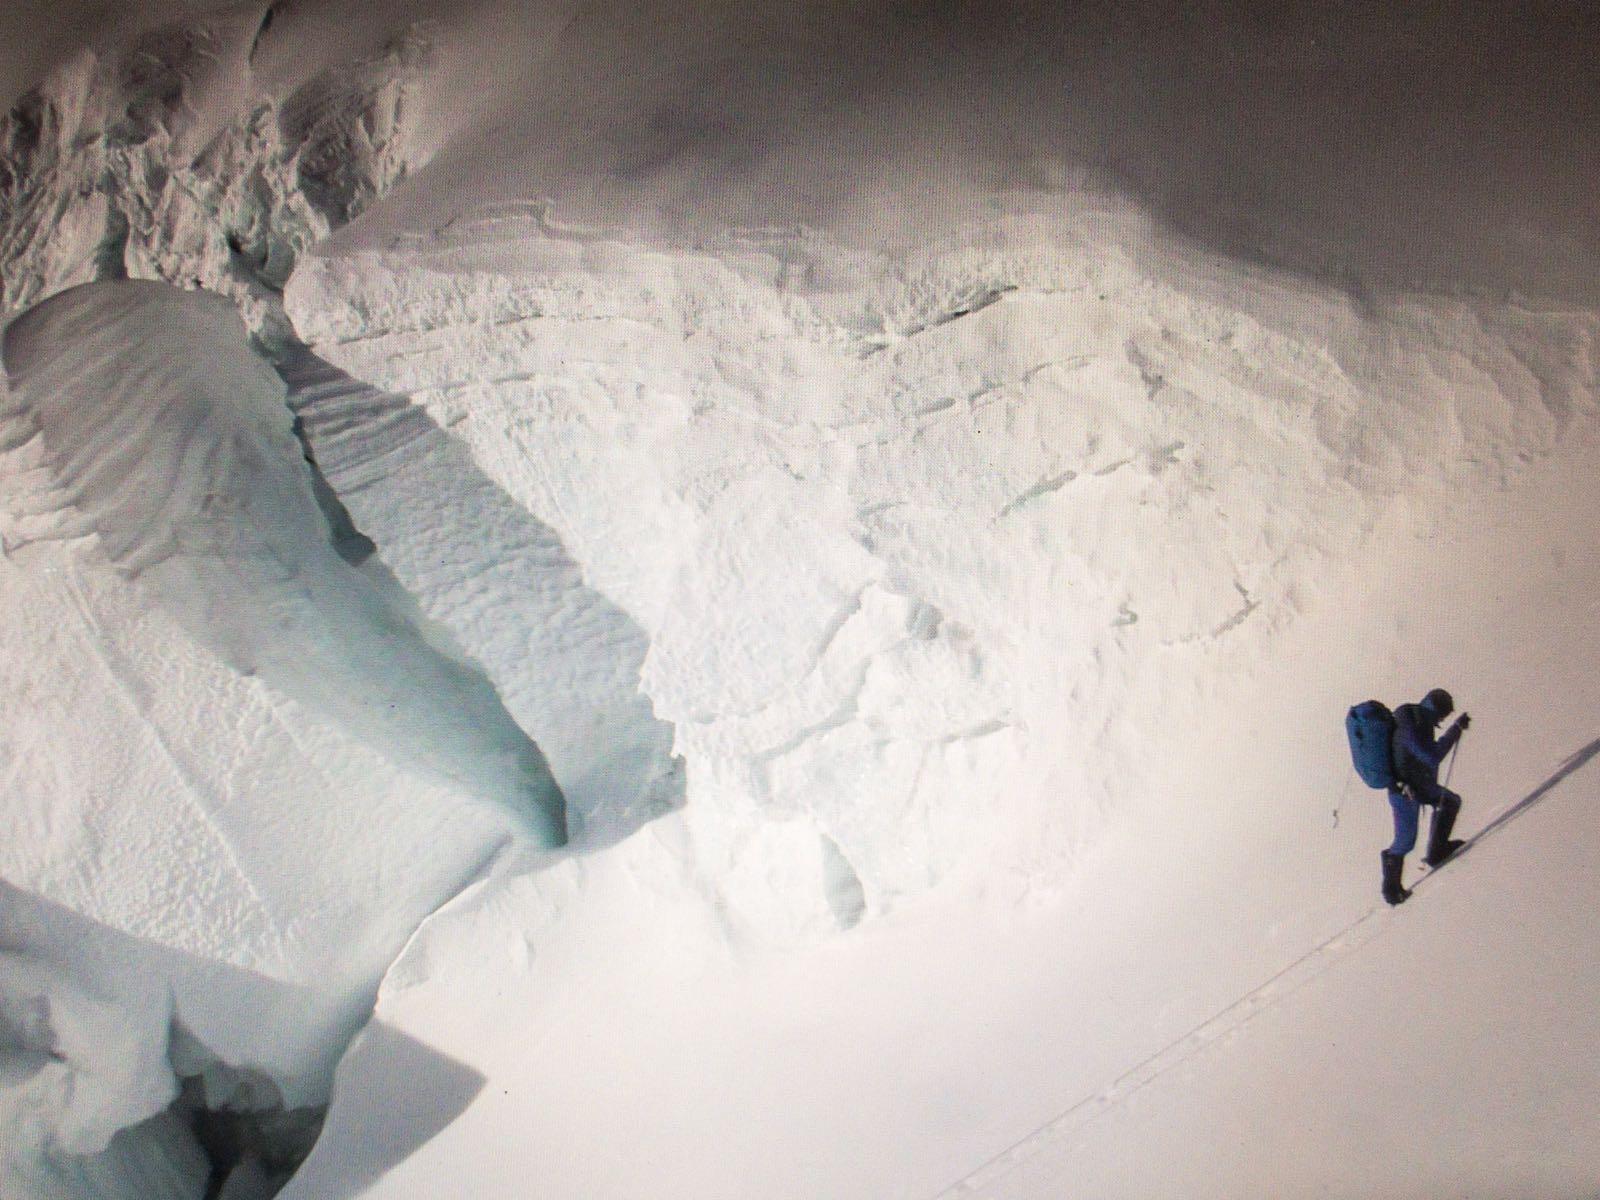 Jornet on his May 21 speed ascent of Everest's North Col route. [Photo] Sebastien Montaz-Rosset/Kilian Jornet collection